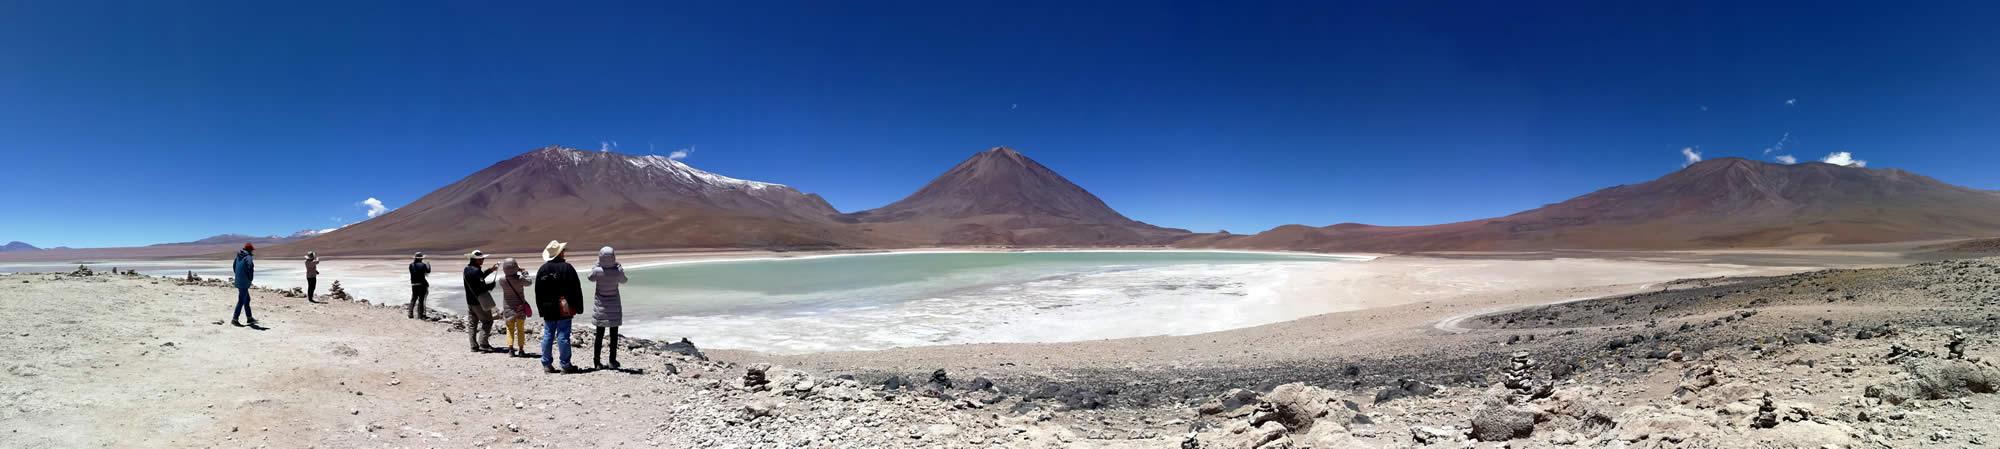 The Green Lagoon or Laguna Verde and the Licancabur Volcano